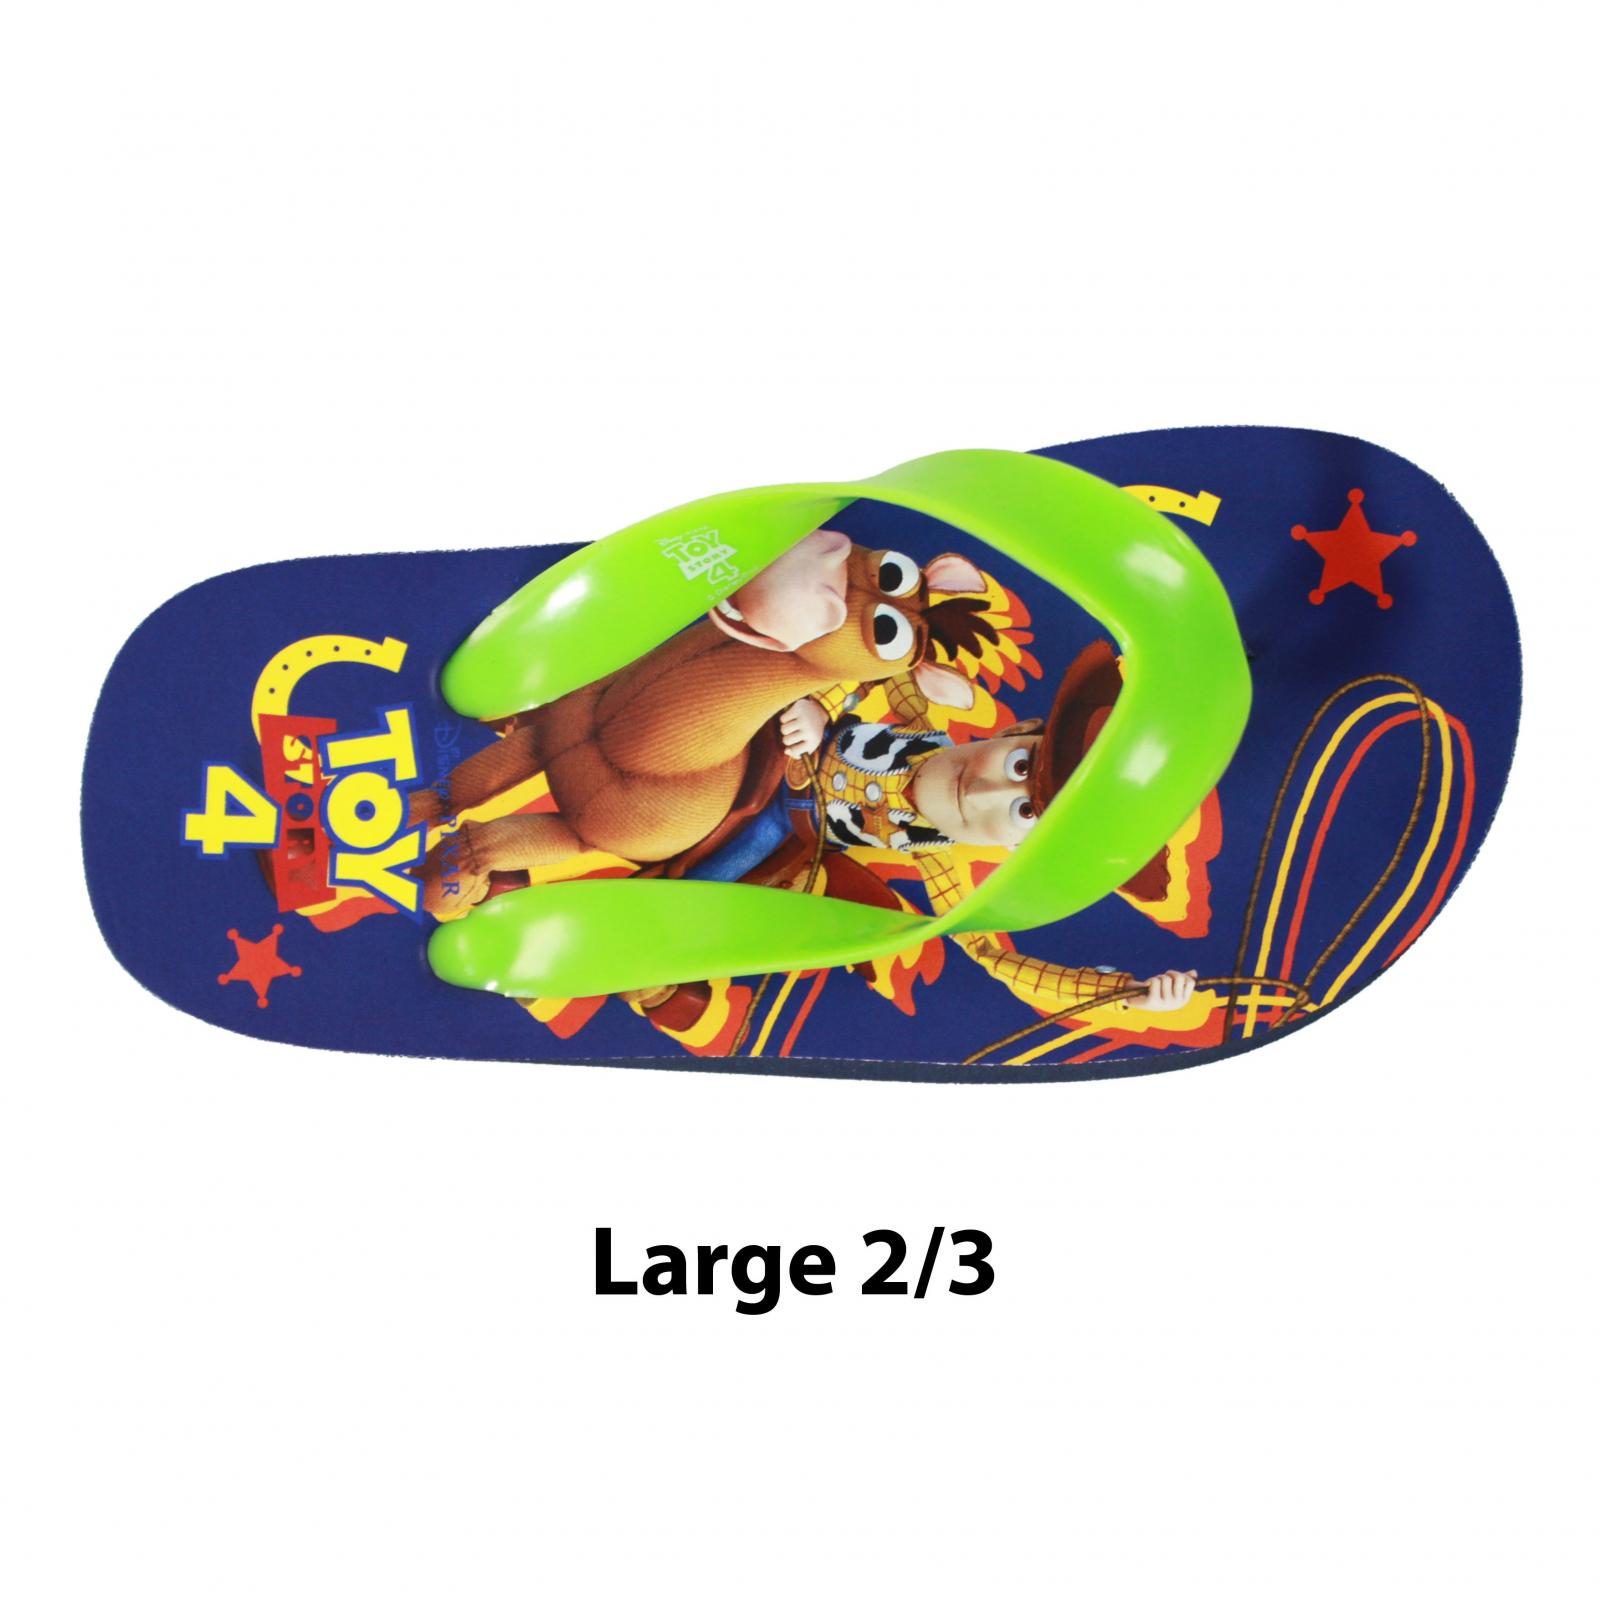 Disney Pixar Toy Story 4 Kids Sandals Green Strap Large 2/3